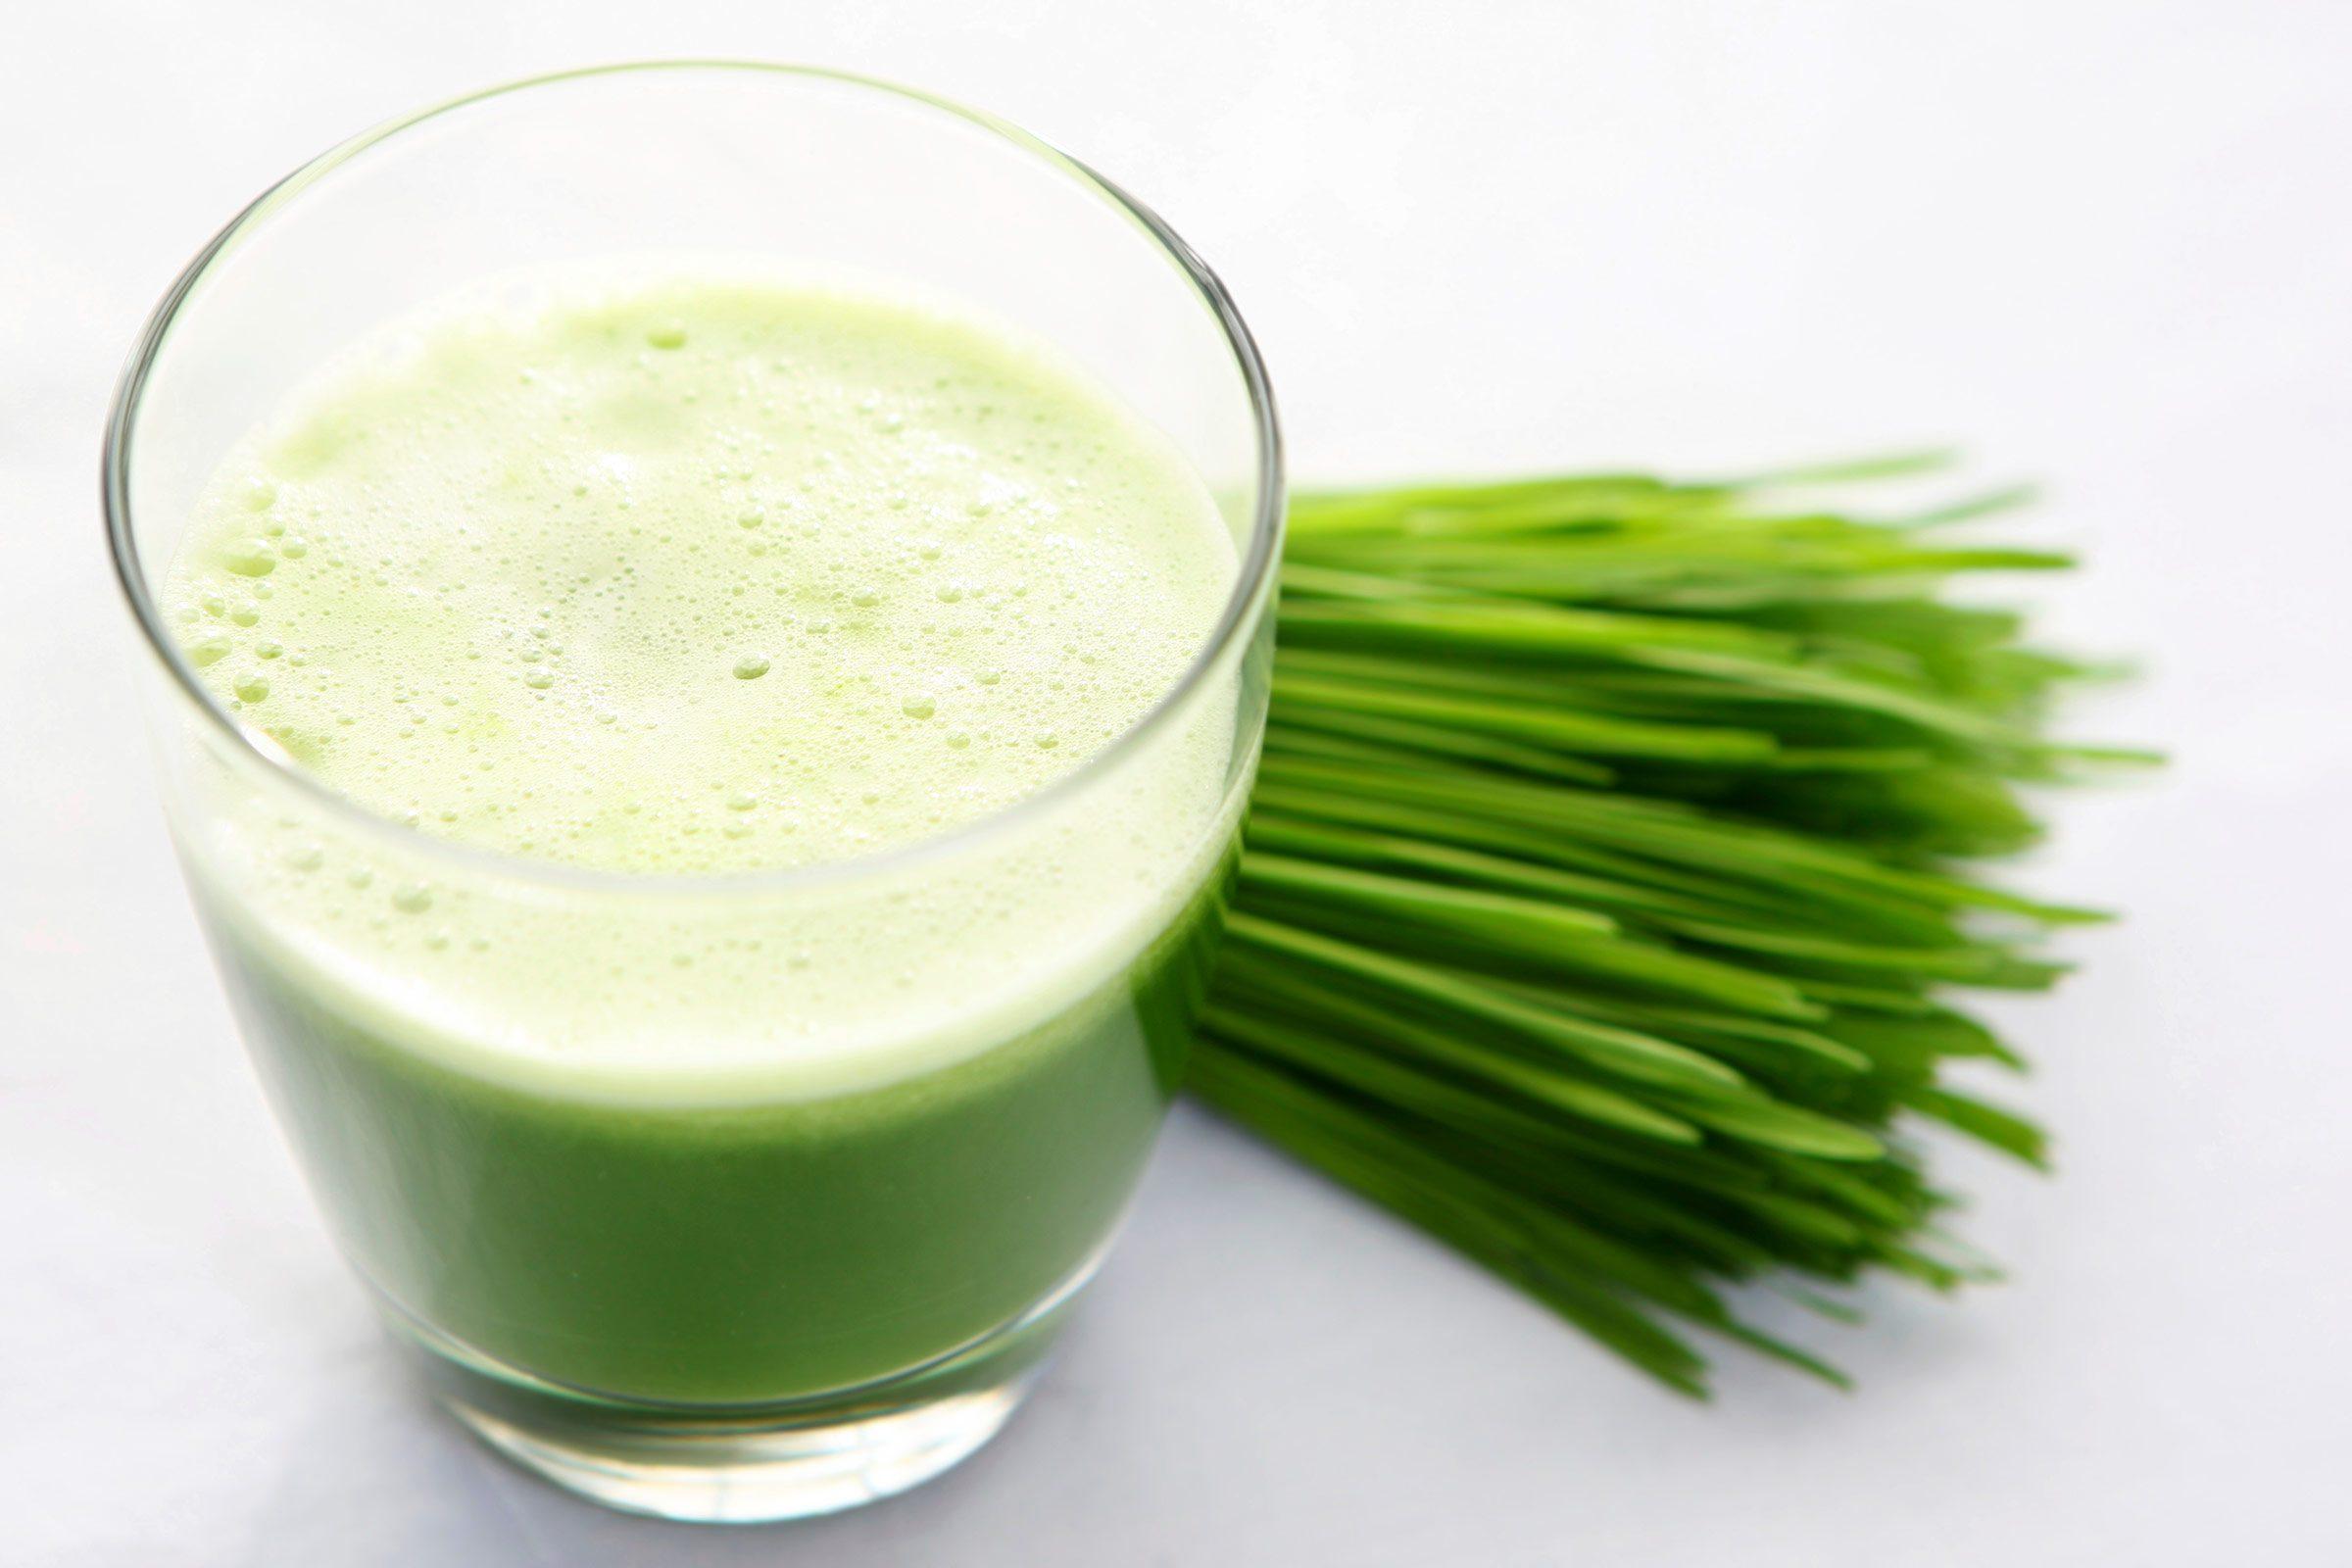 Sore throat remedy: Wheatgrass juice